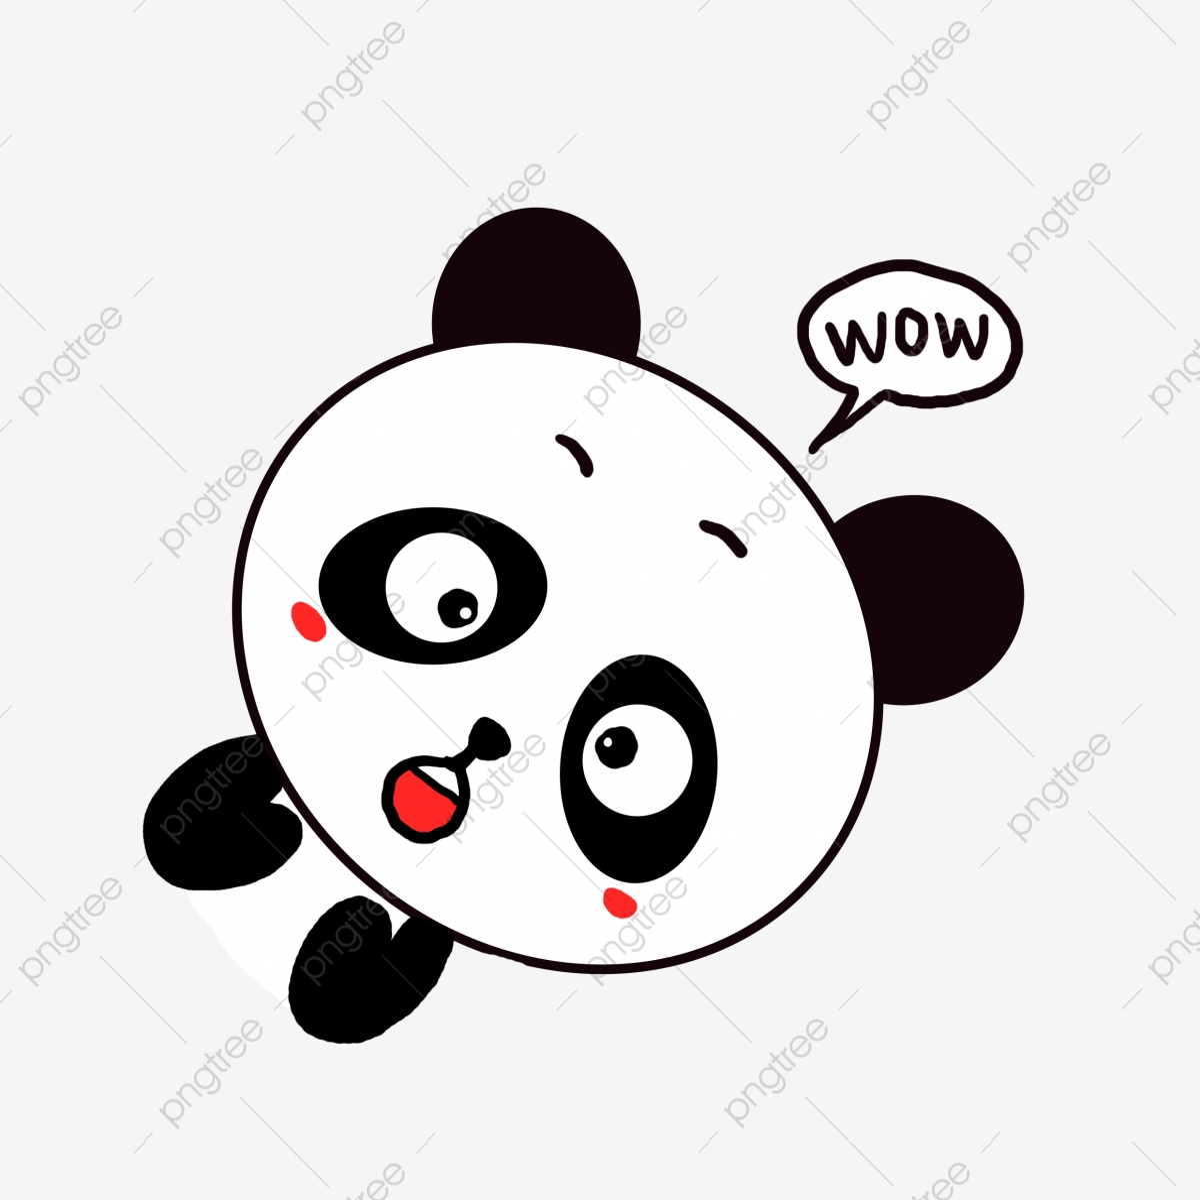 Versi Q Comel Kartun Haiwan Kecil Kartun Panda Kecil Fail